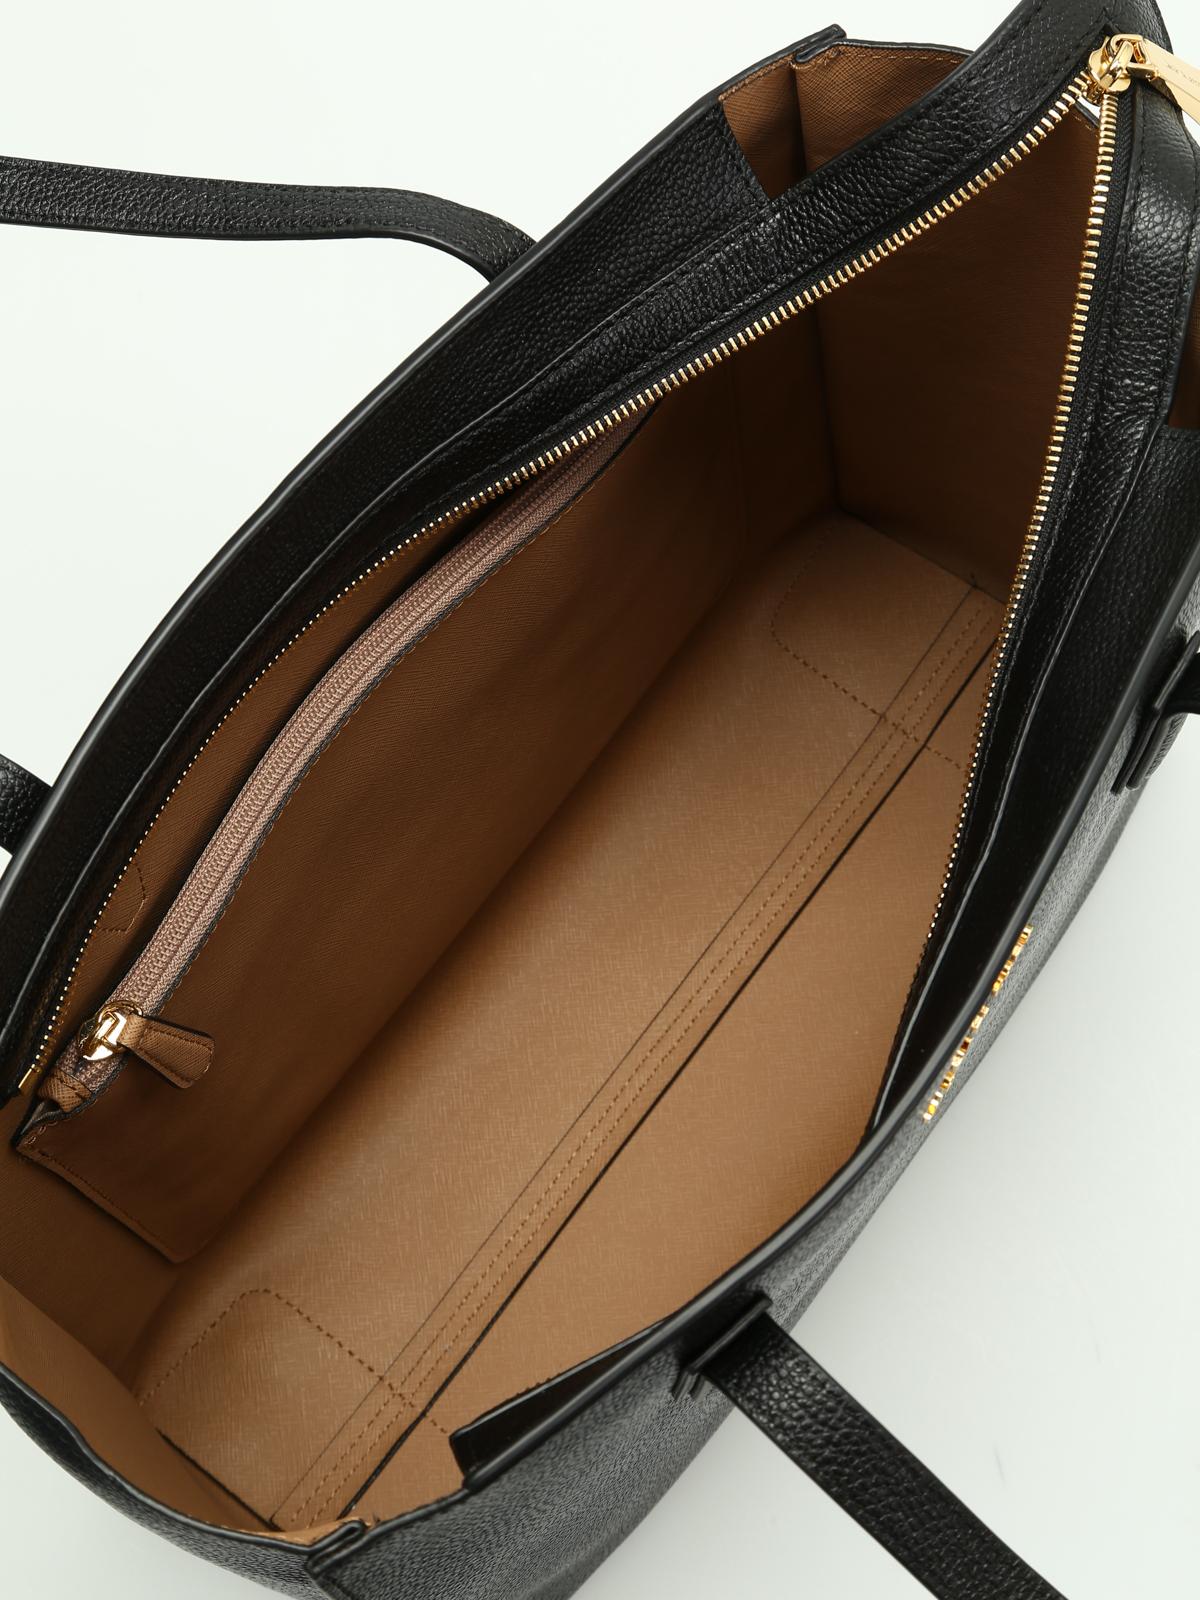 michael kors shopper schwarz handtaschen. Black Bedroom Furniture Sets. Home Design Ideas